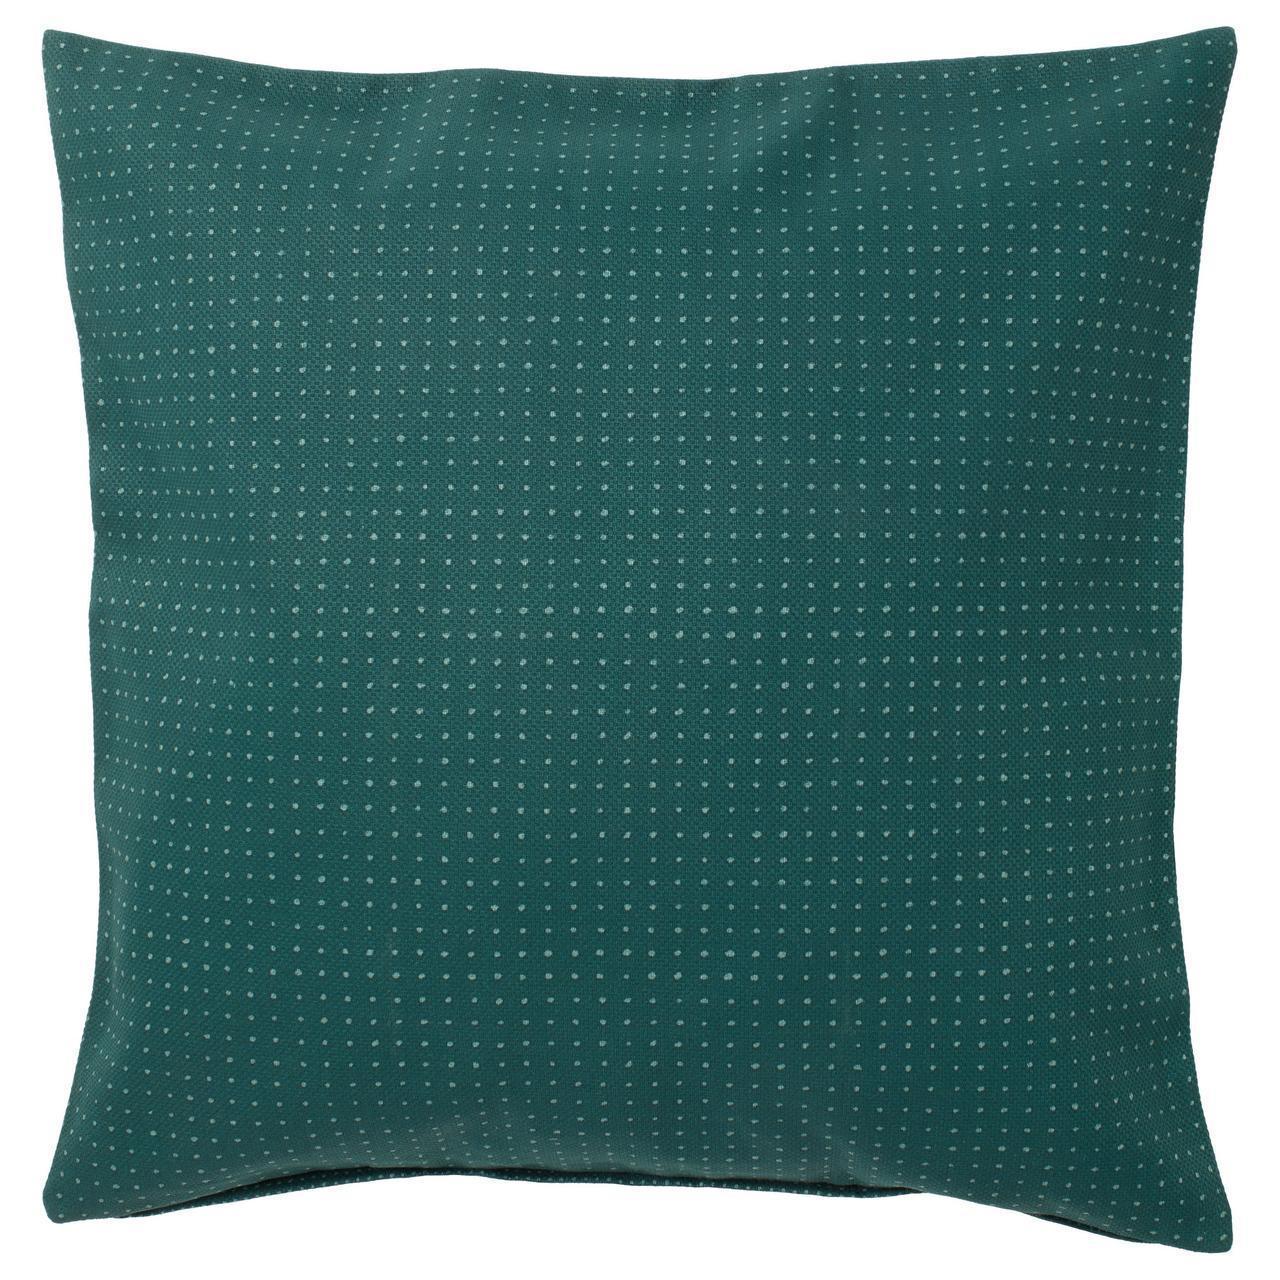 IKEA YPPERLIG Наволочка на декоративную подушку, зеленый, пунктир  (503.463.82)